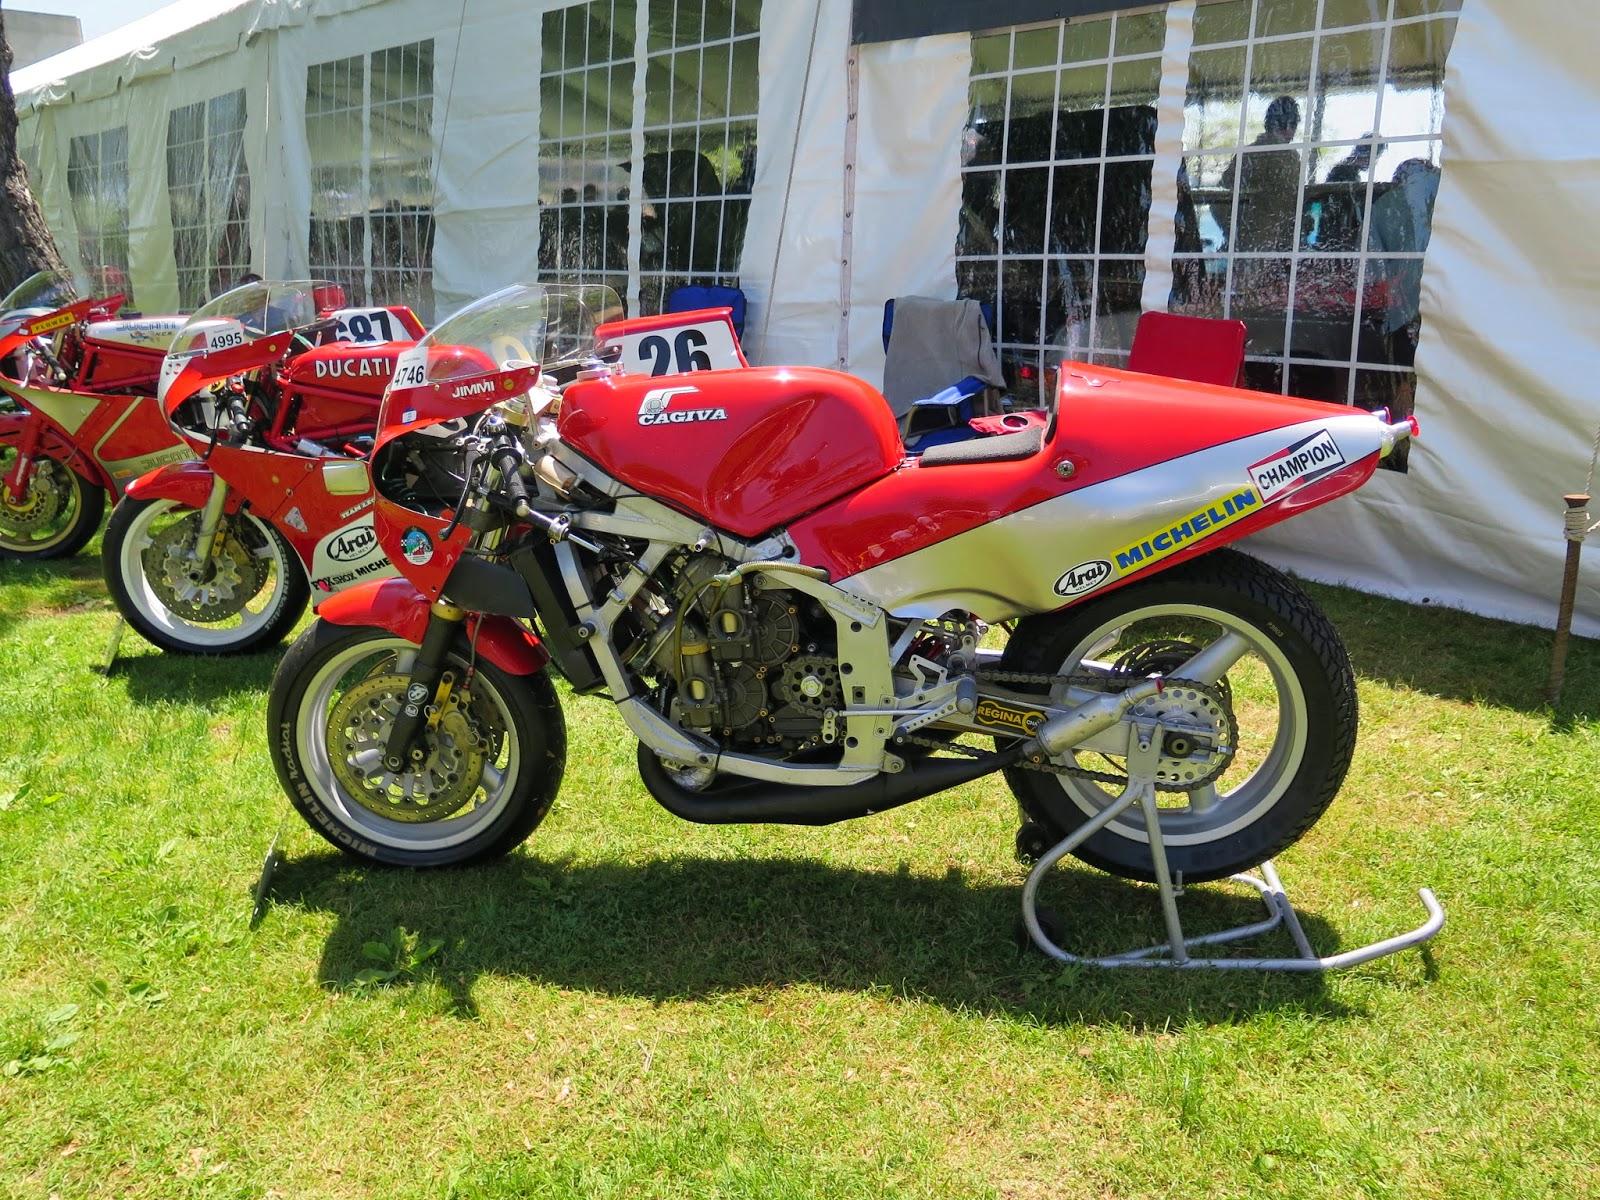 1984 Cagiva 500 GP Two Stroke - Left Side - Moto Bellissima